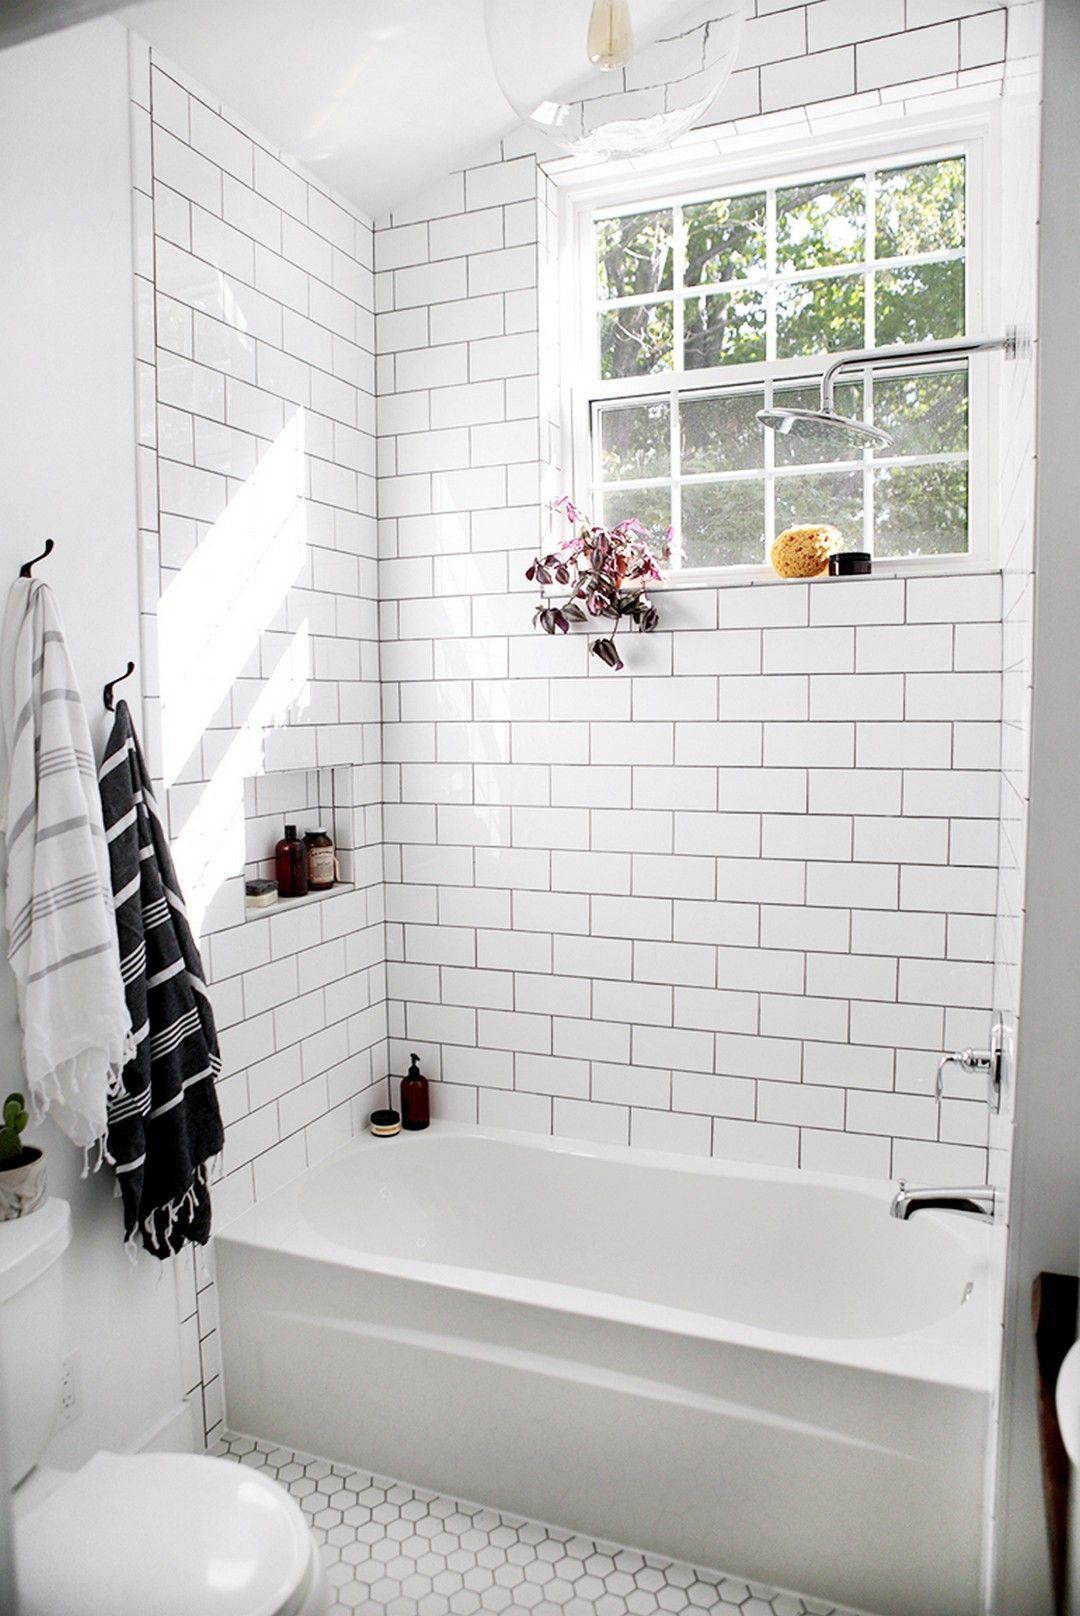 54 Gorgeous Farmhouse Master Bathroom Decorating Ideas | Pinterest ...